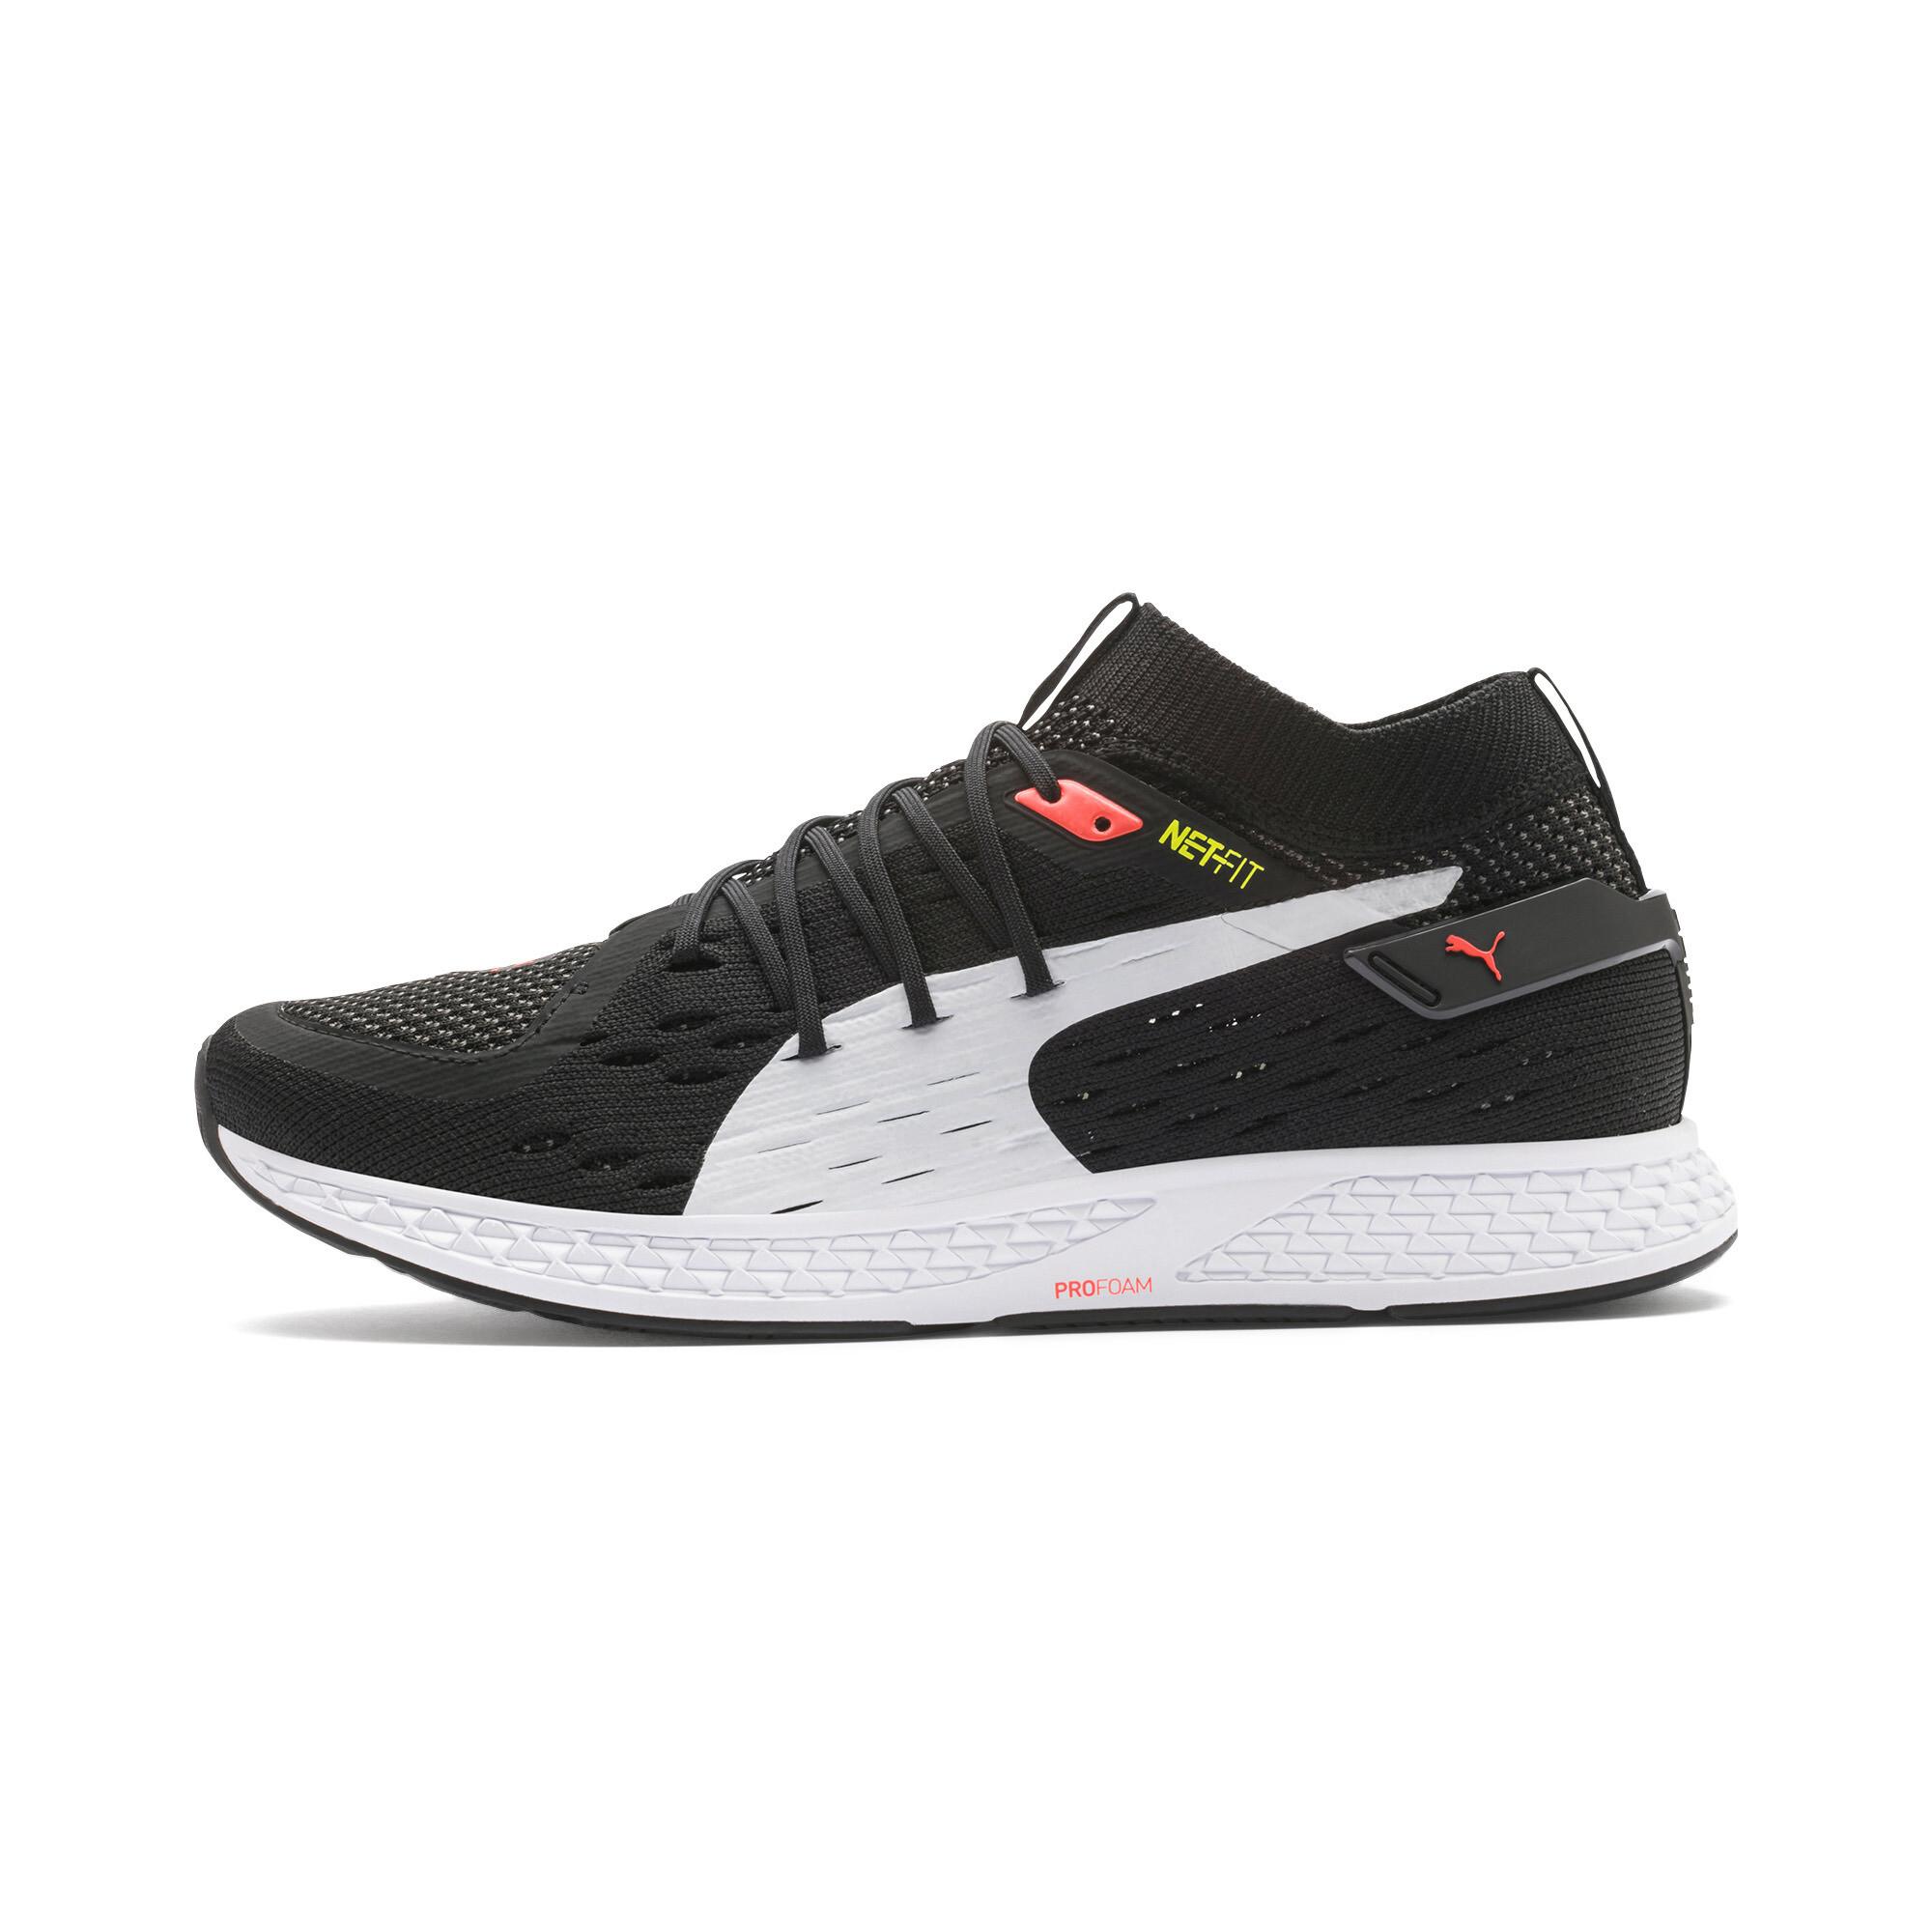 PUMA-SPEED-500-Men-039-s-Running-Shoes-Men-Shoe-Running thumbnail 4